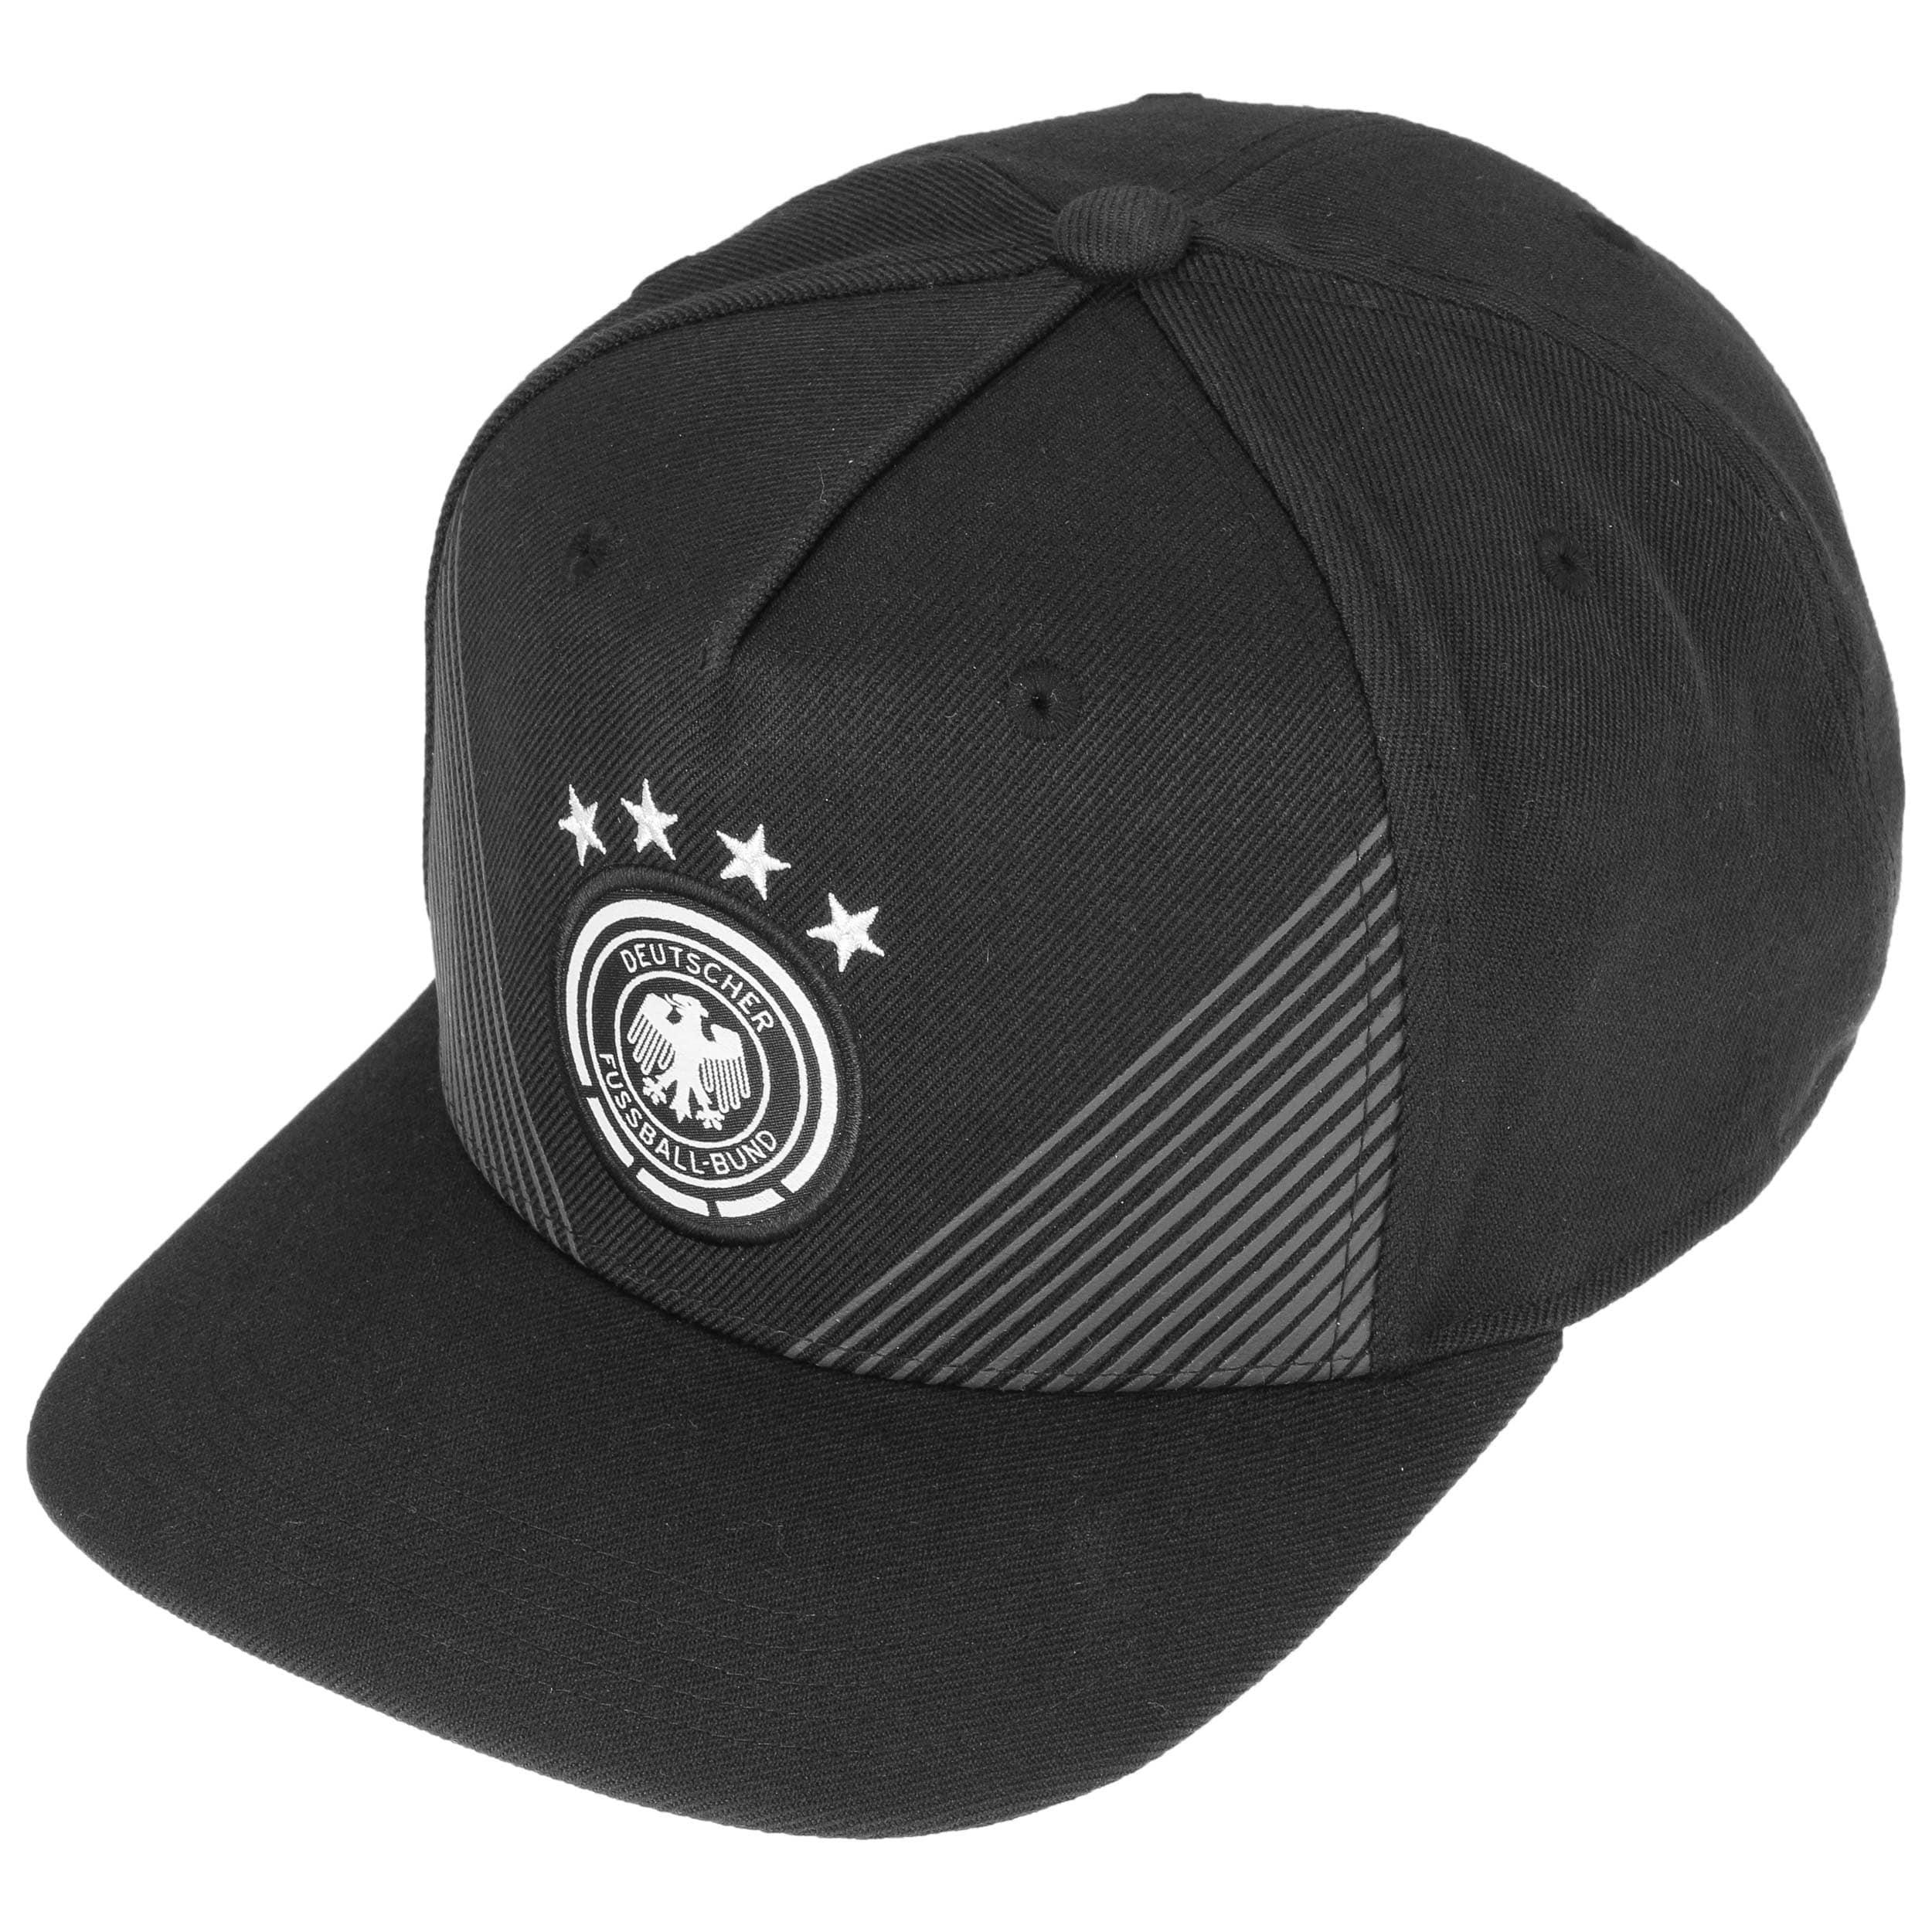 d77c3e74ace DFB Home Snapback Cap by adidas - black 1 ...